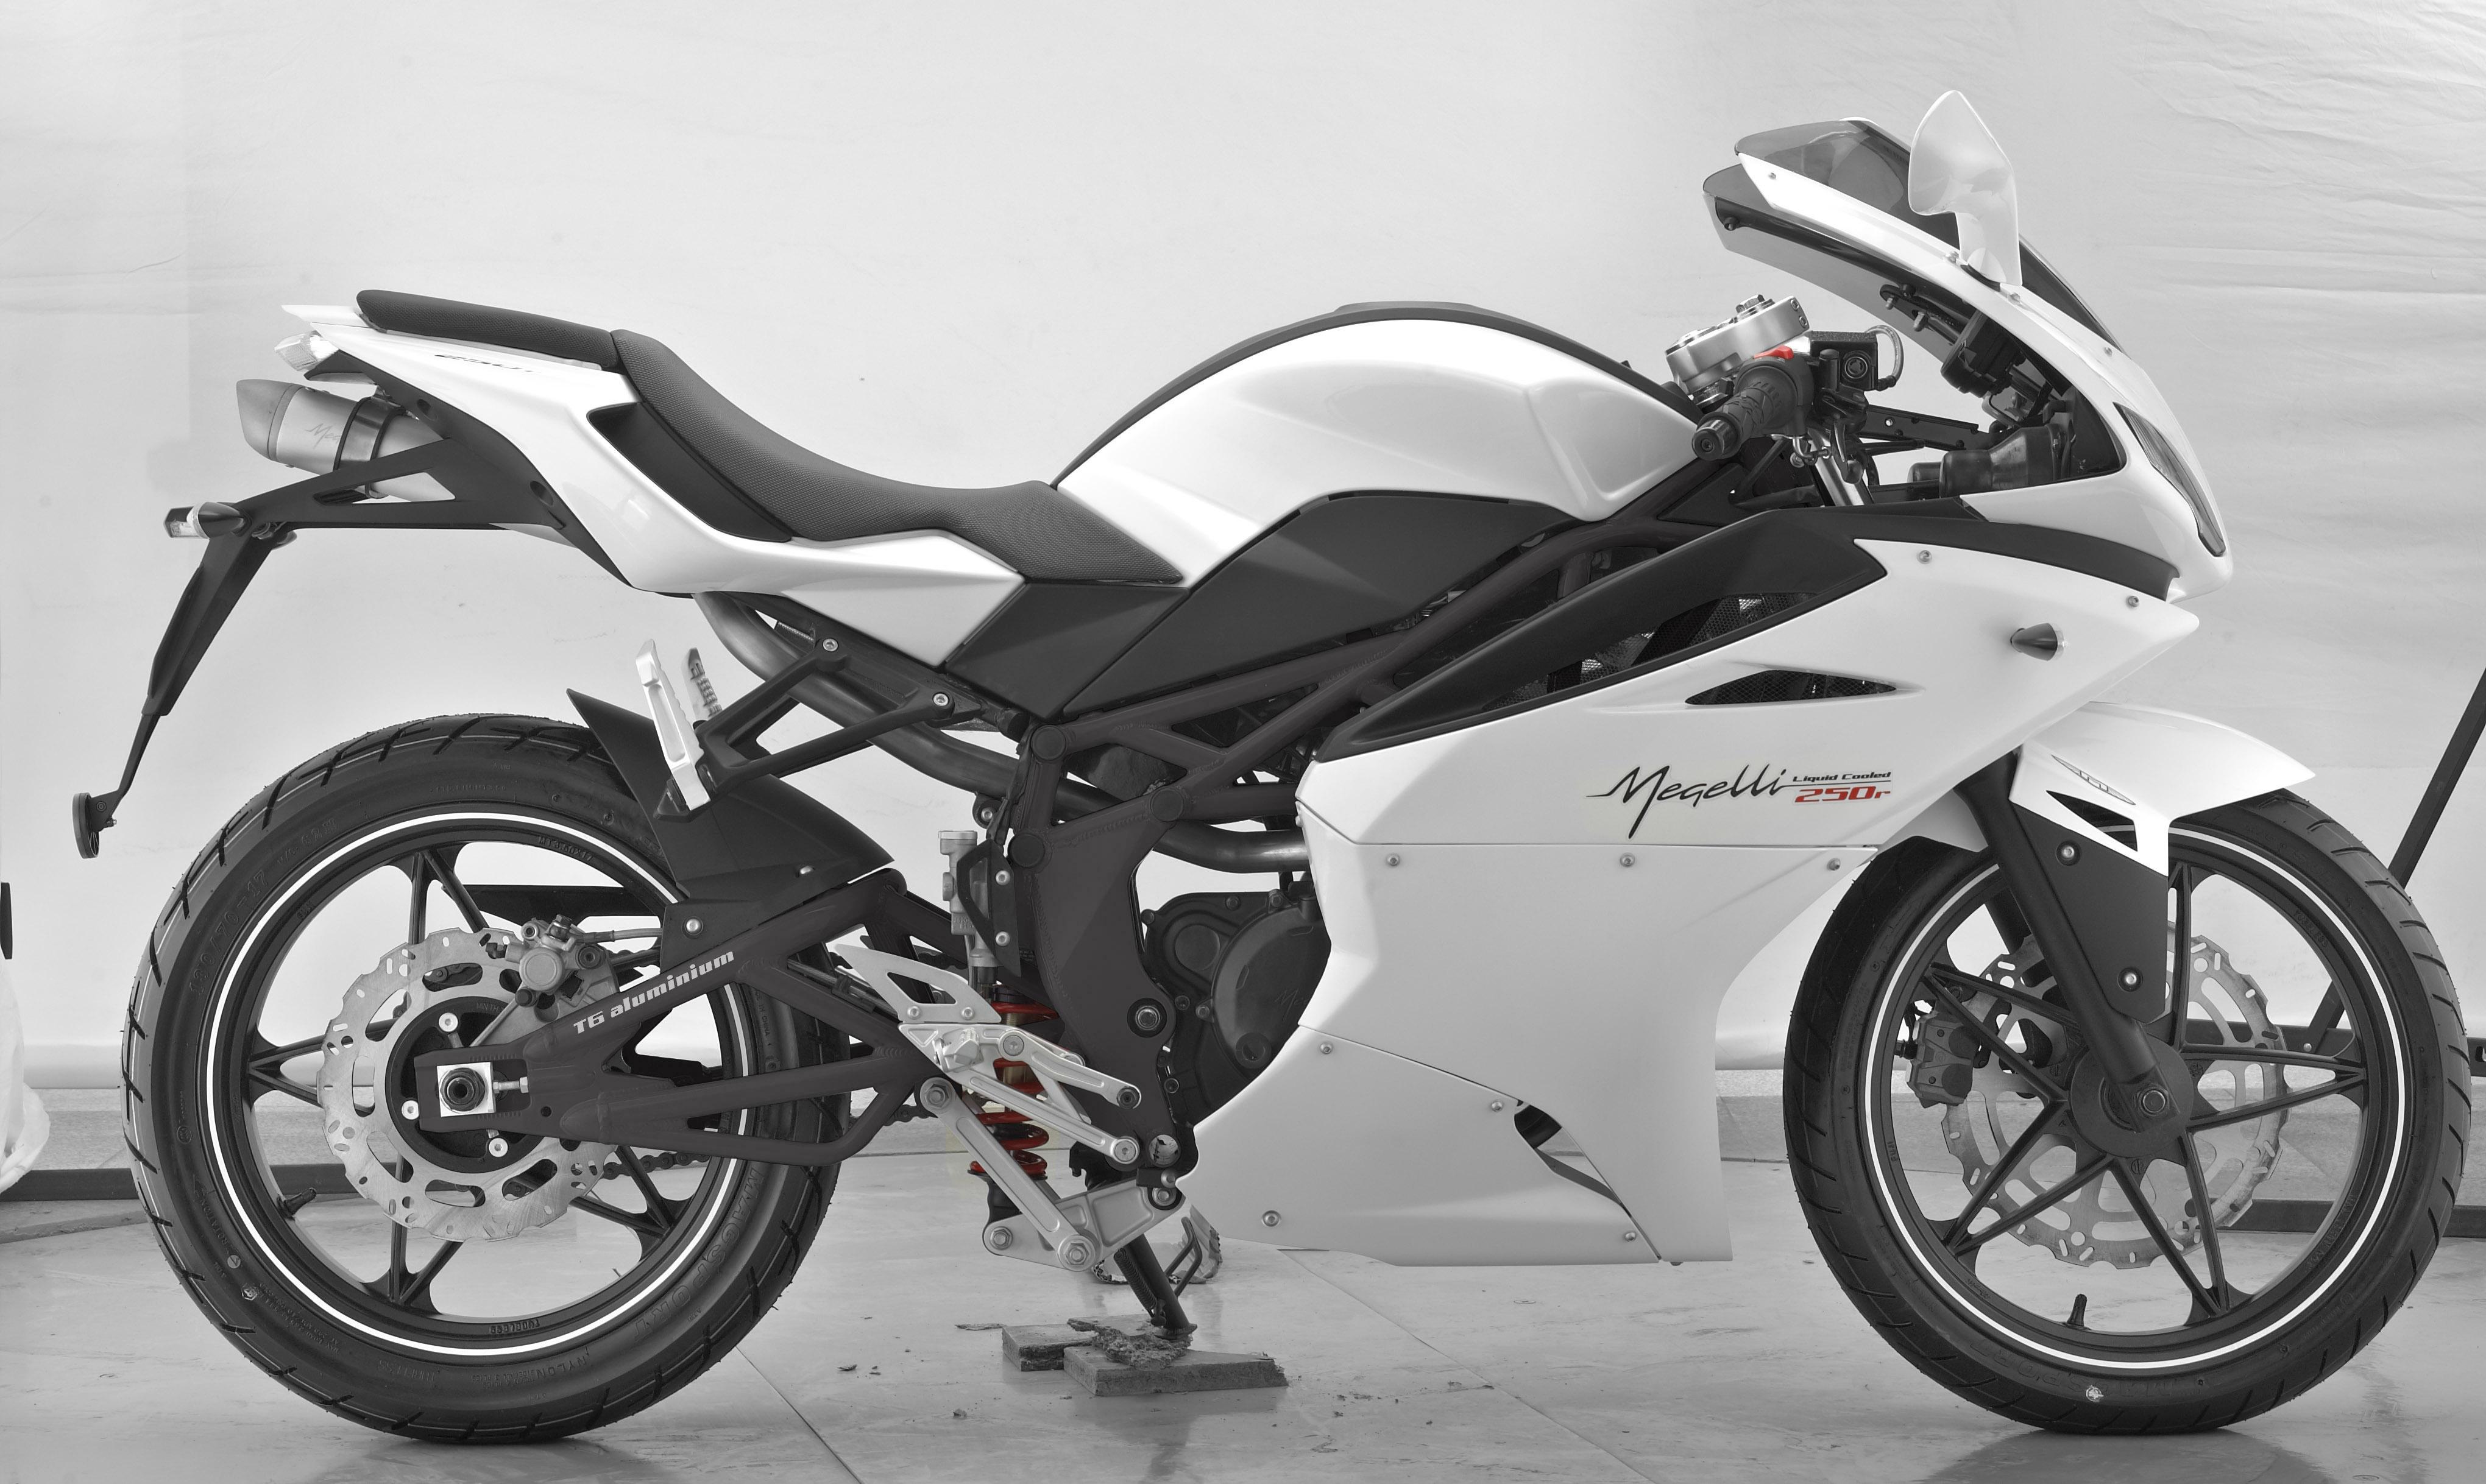 Megelli Sport R- White